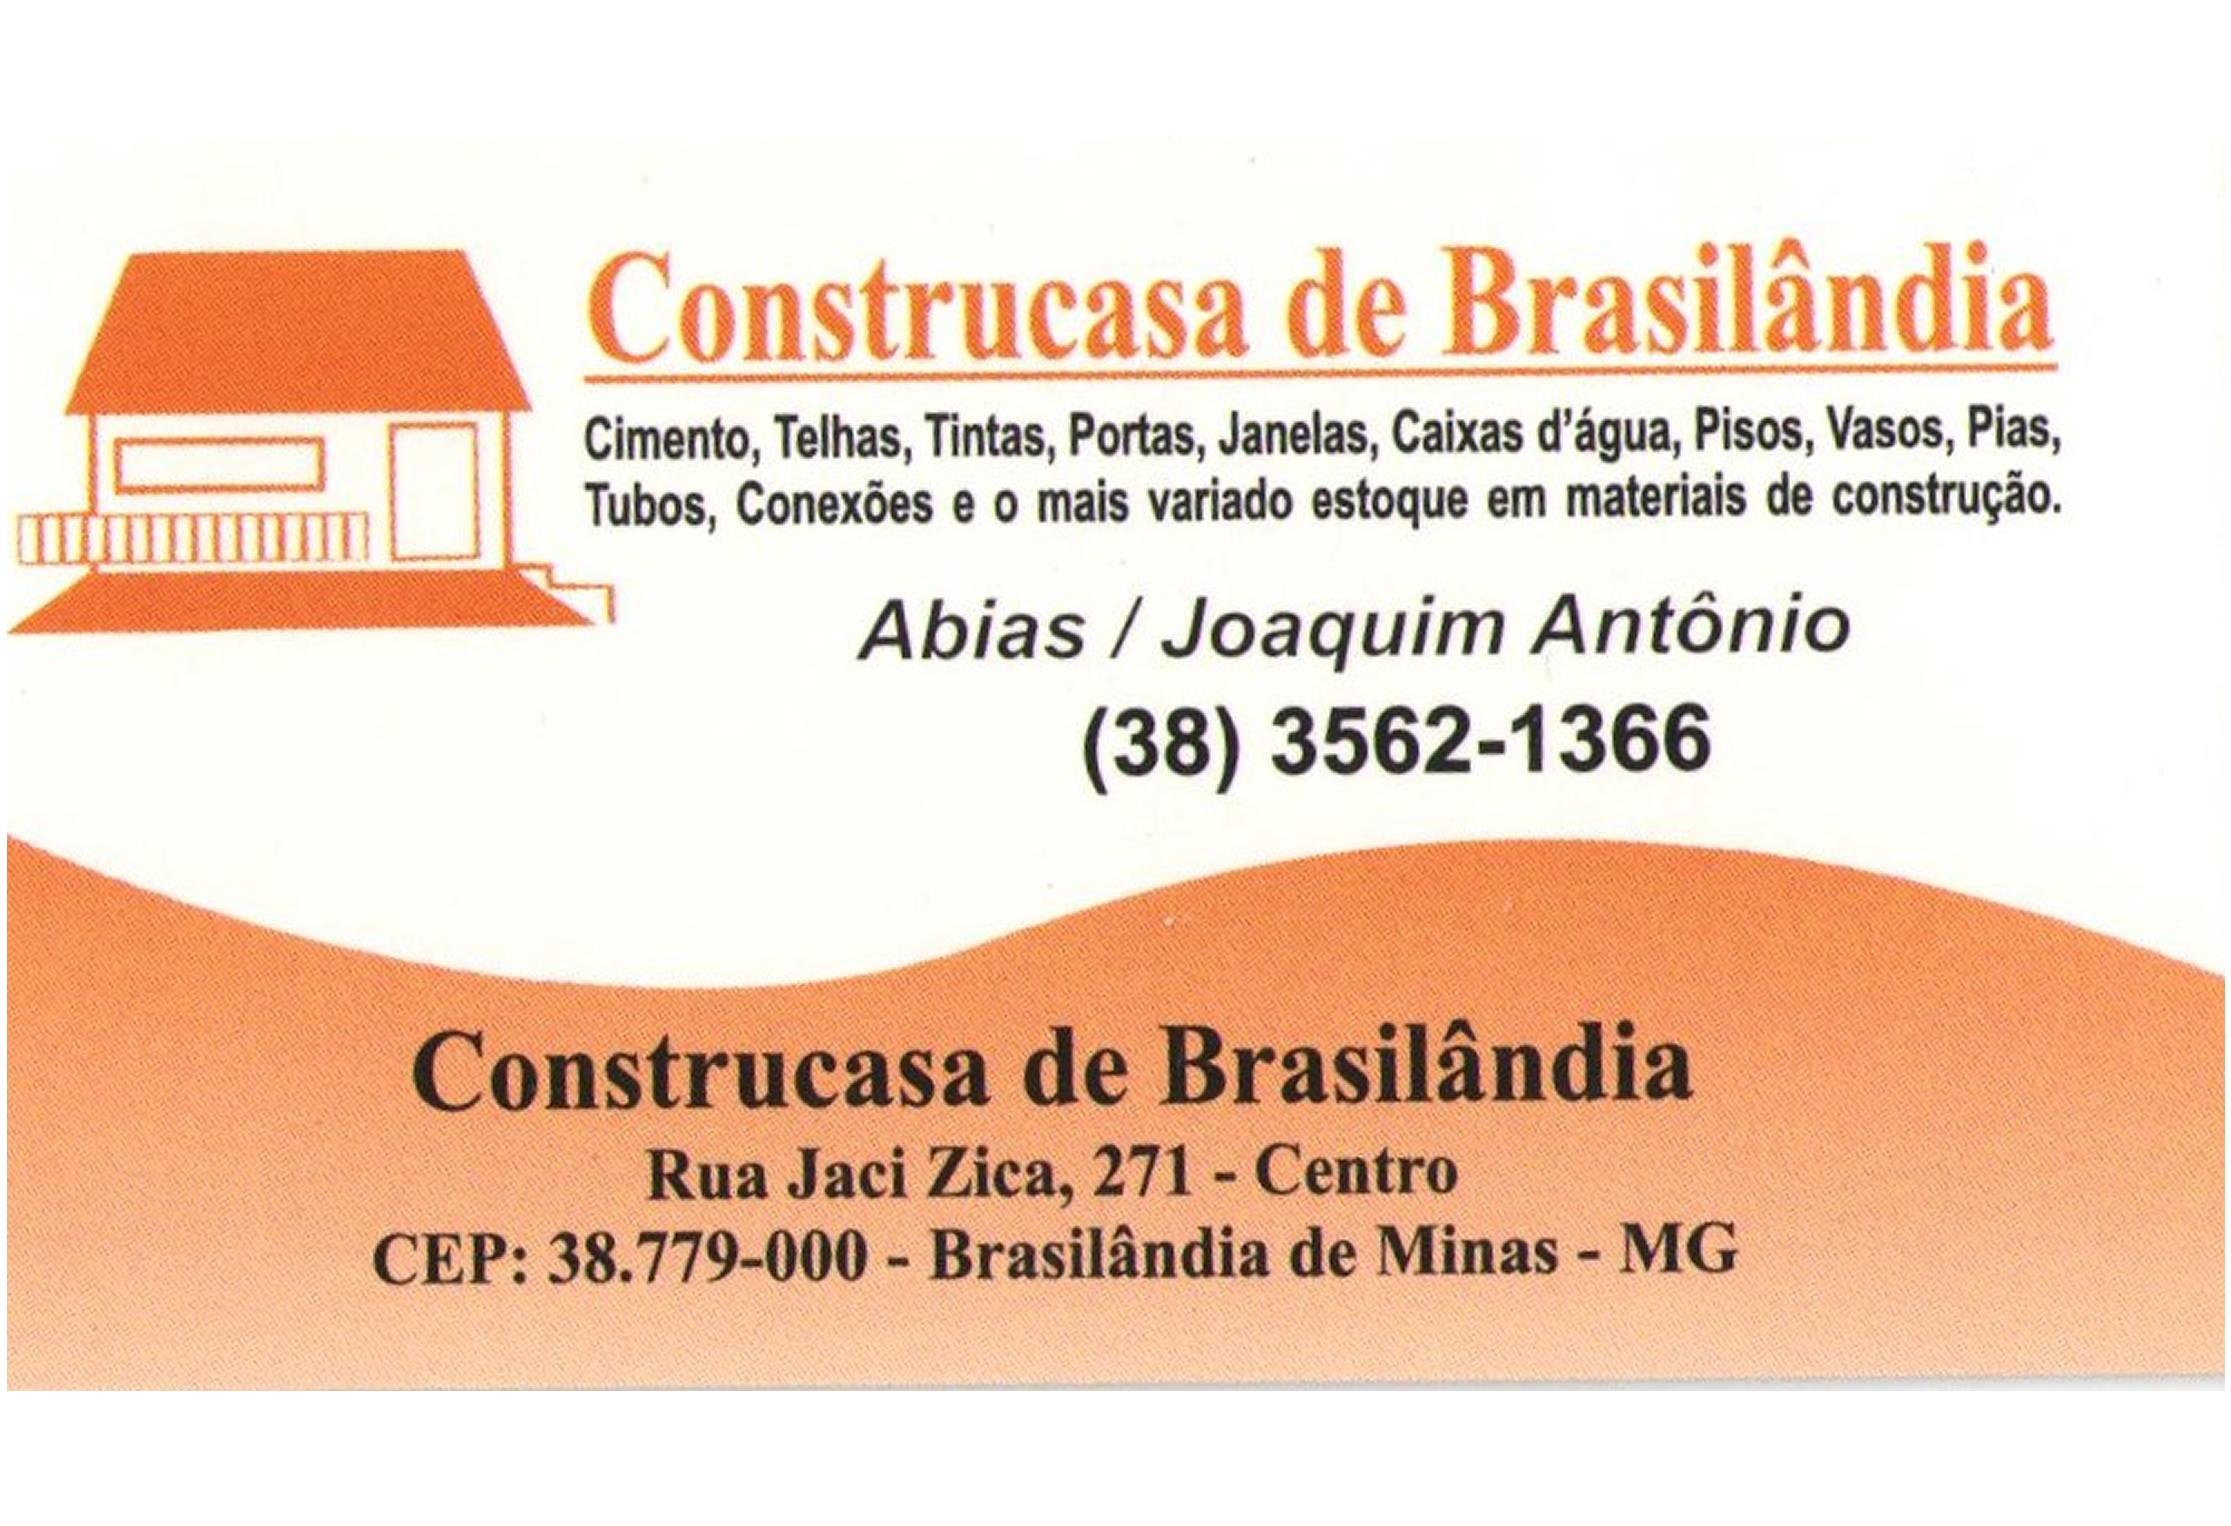 Construcasa de Brasilândia